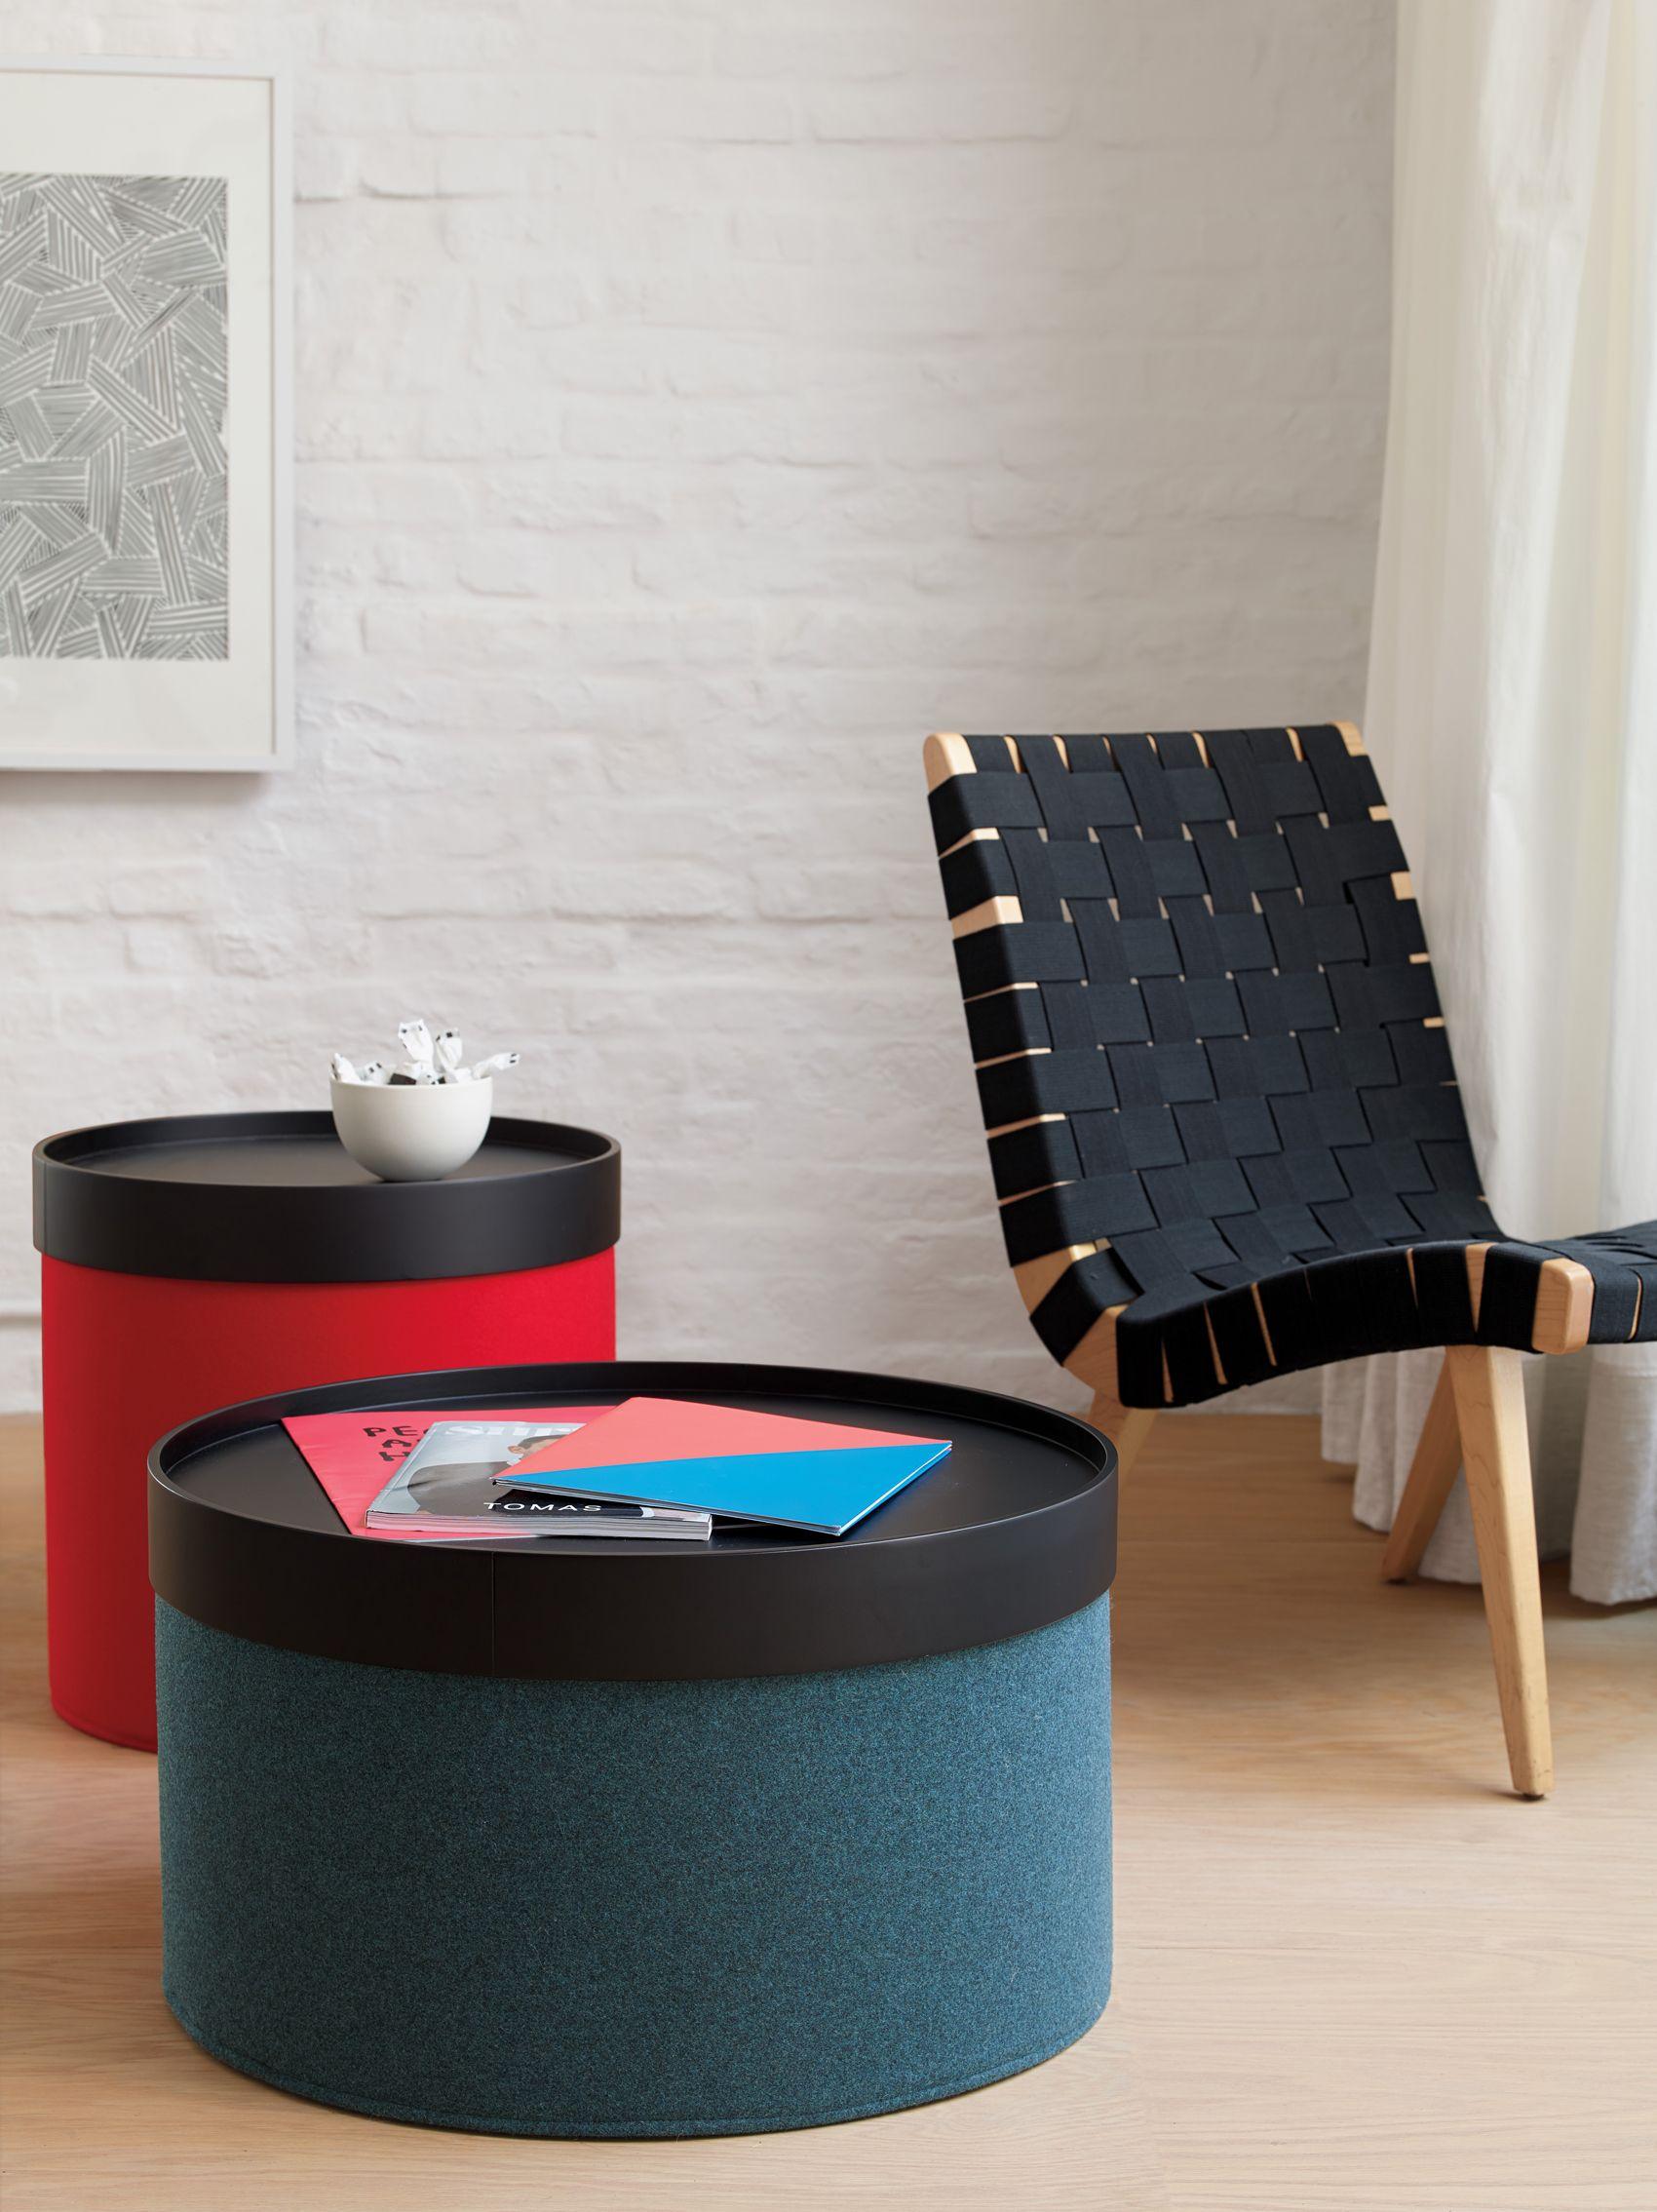 3e86a00c642c7755163dea748ebd3f62 Incroyable De Table Basse Le Corbusier Concept